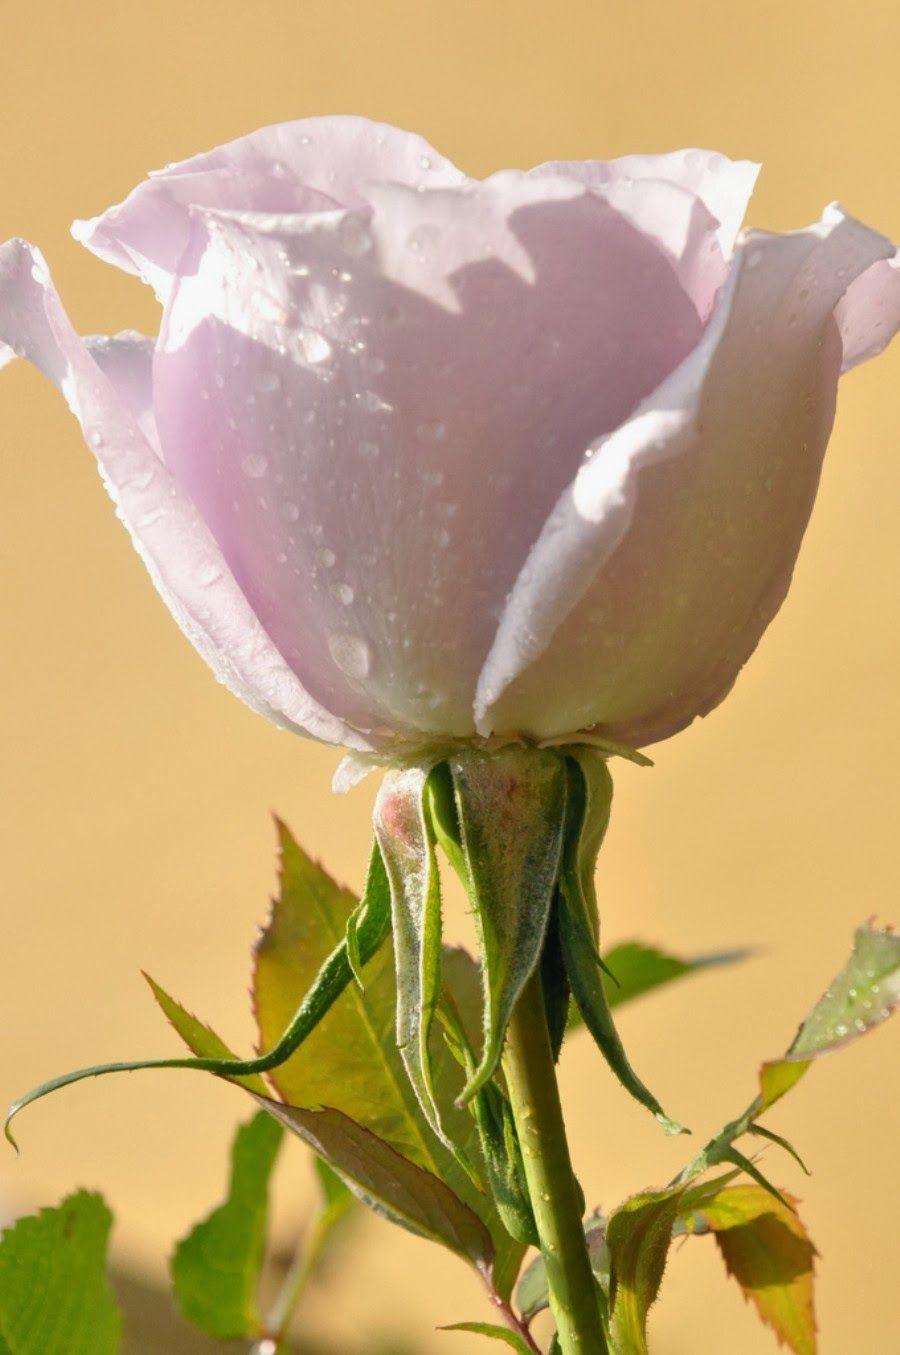 World Beautiful Flowers Images Hd Djiwallpaper